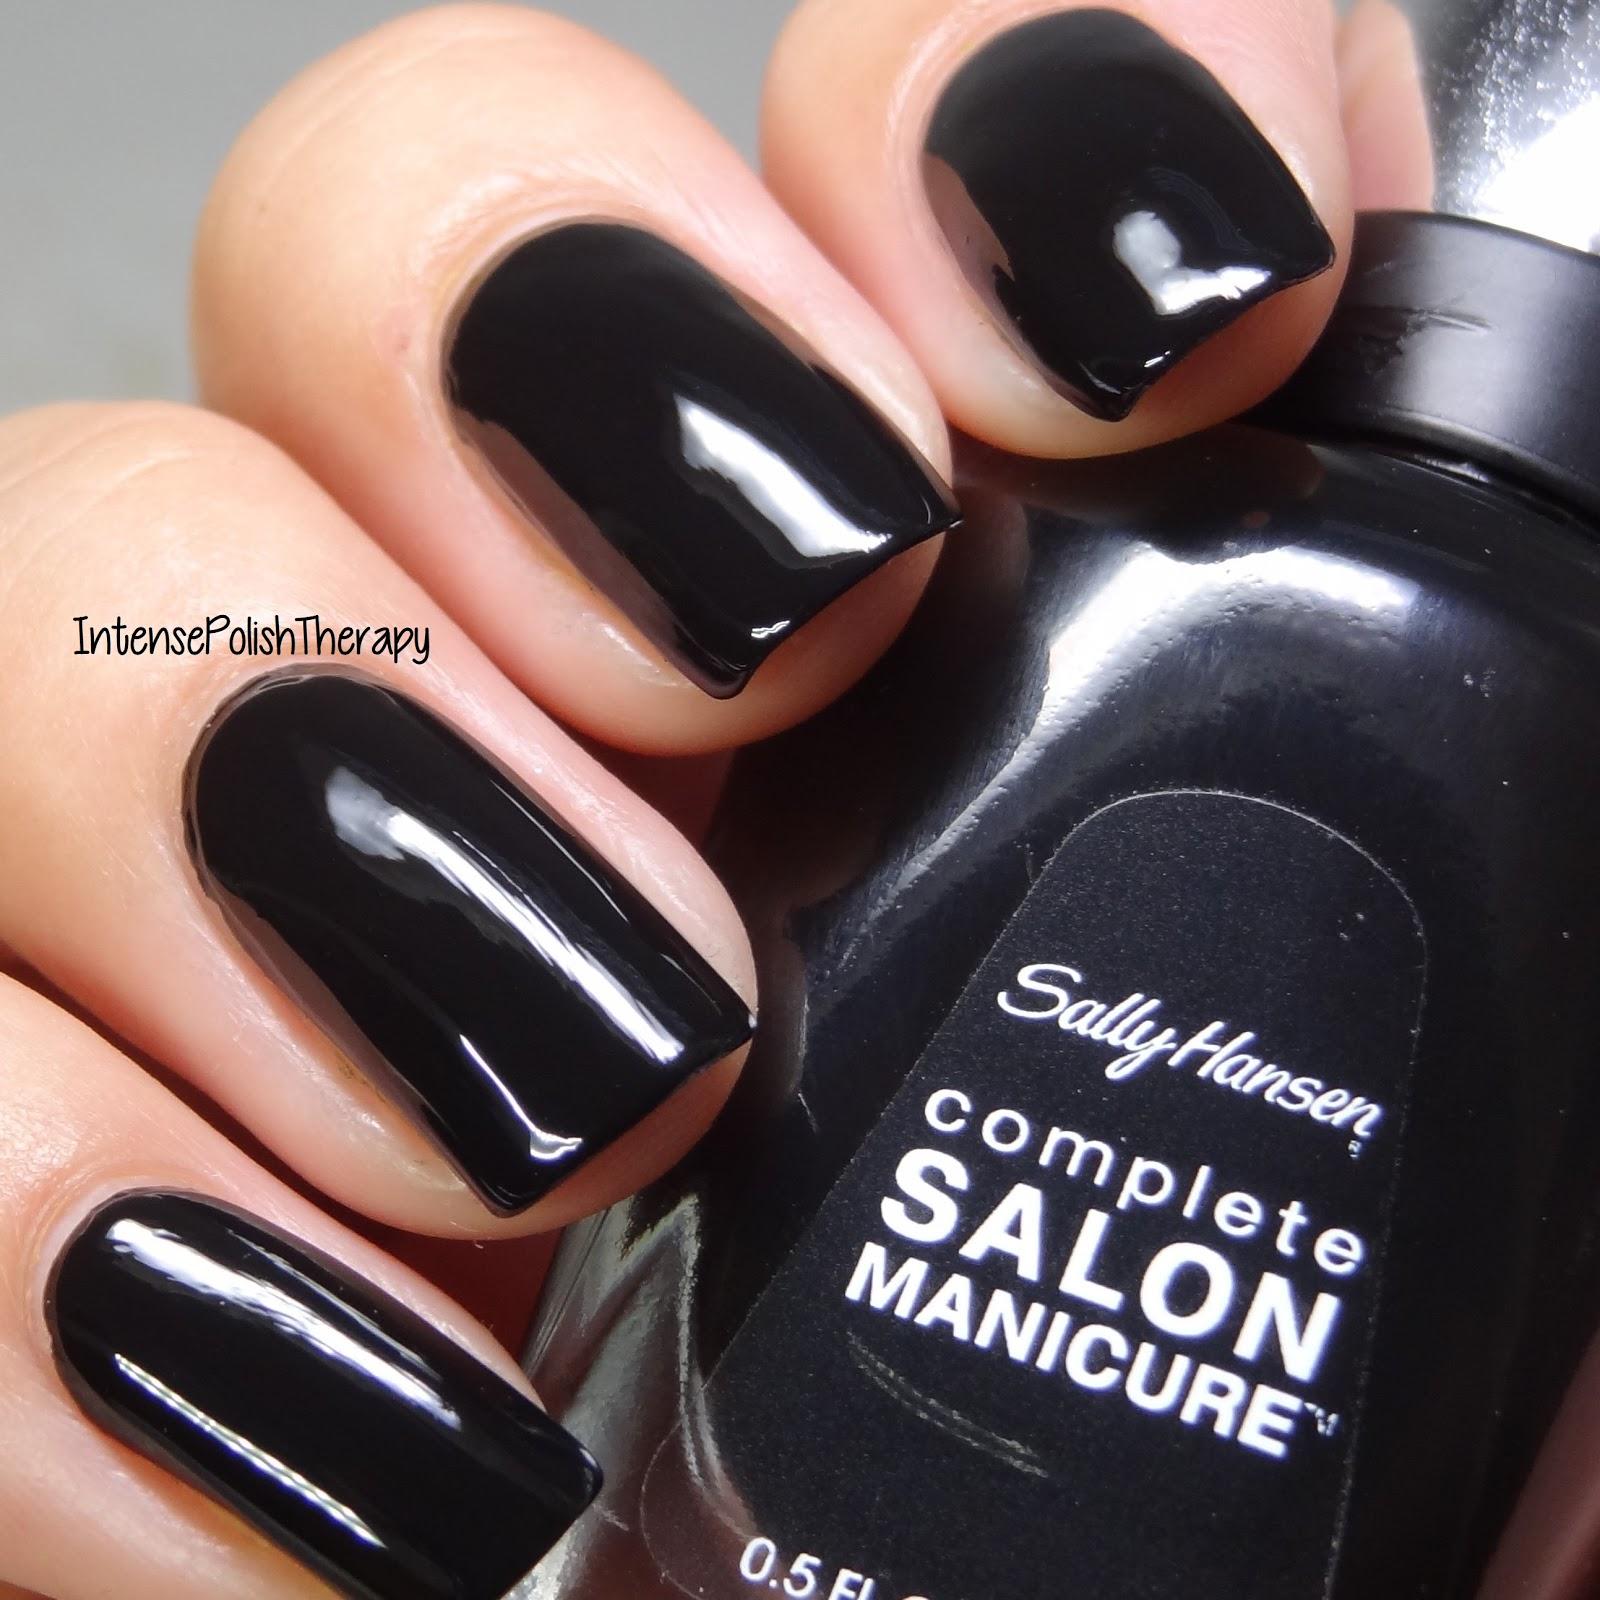 Intense Polish Therapy Sally Hansen Complete Salon Manicure Black To Basics Collection